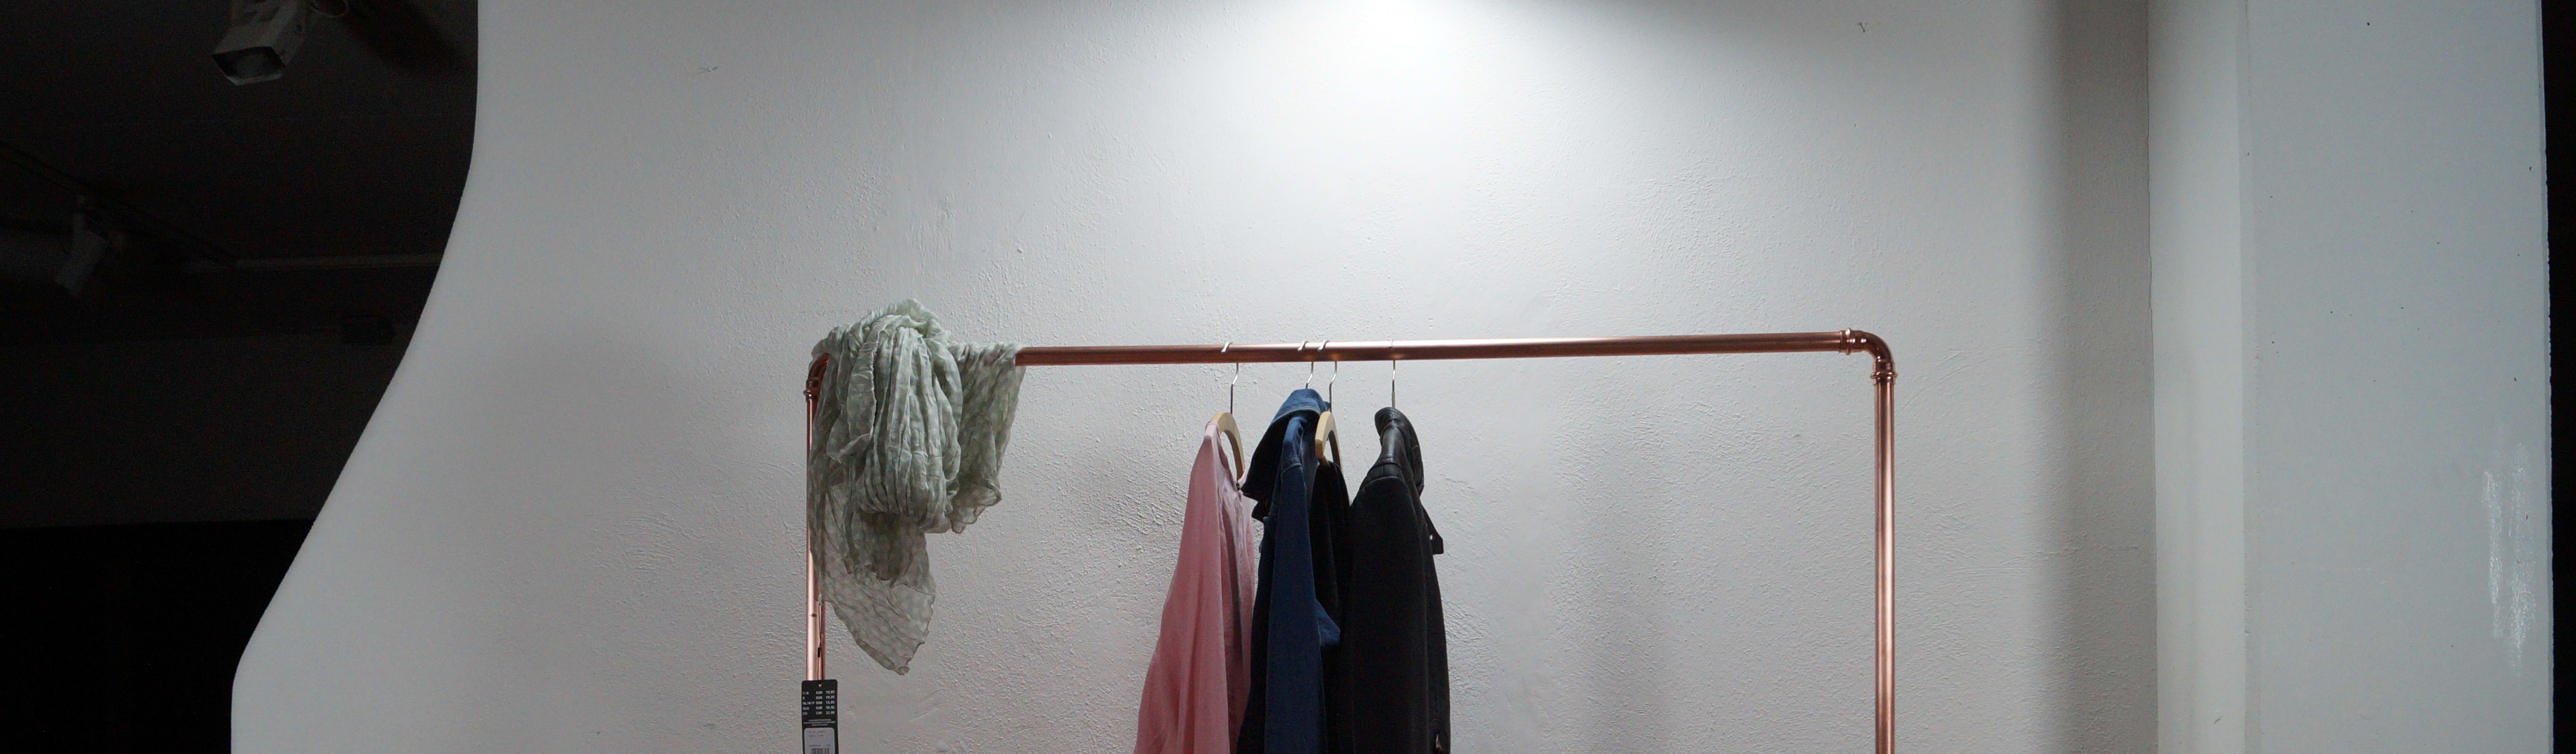 kleiderstange industry kupfer par ofen bräuer | homify